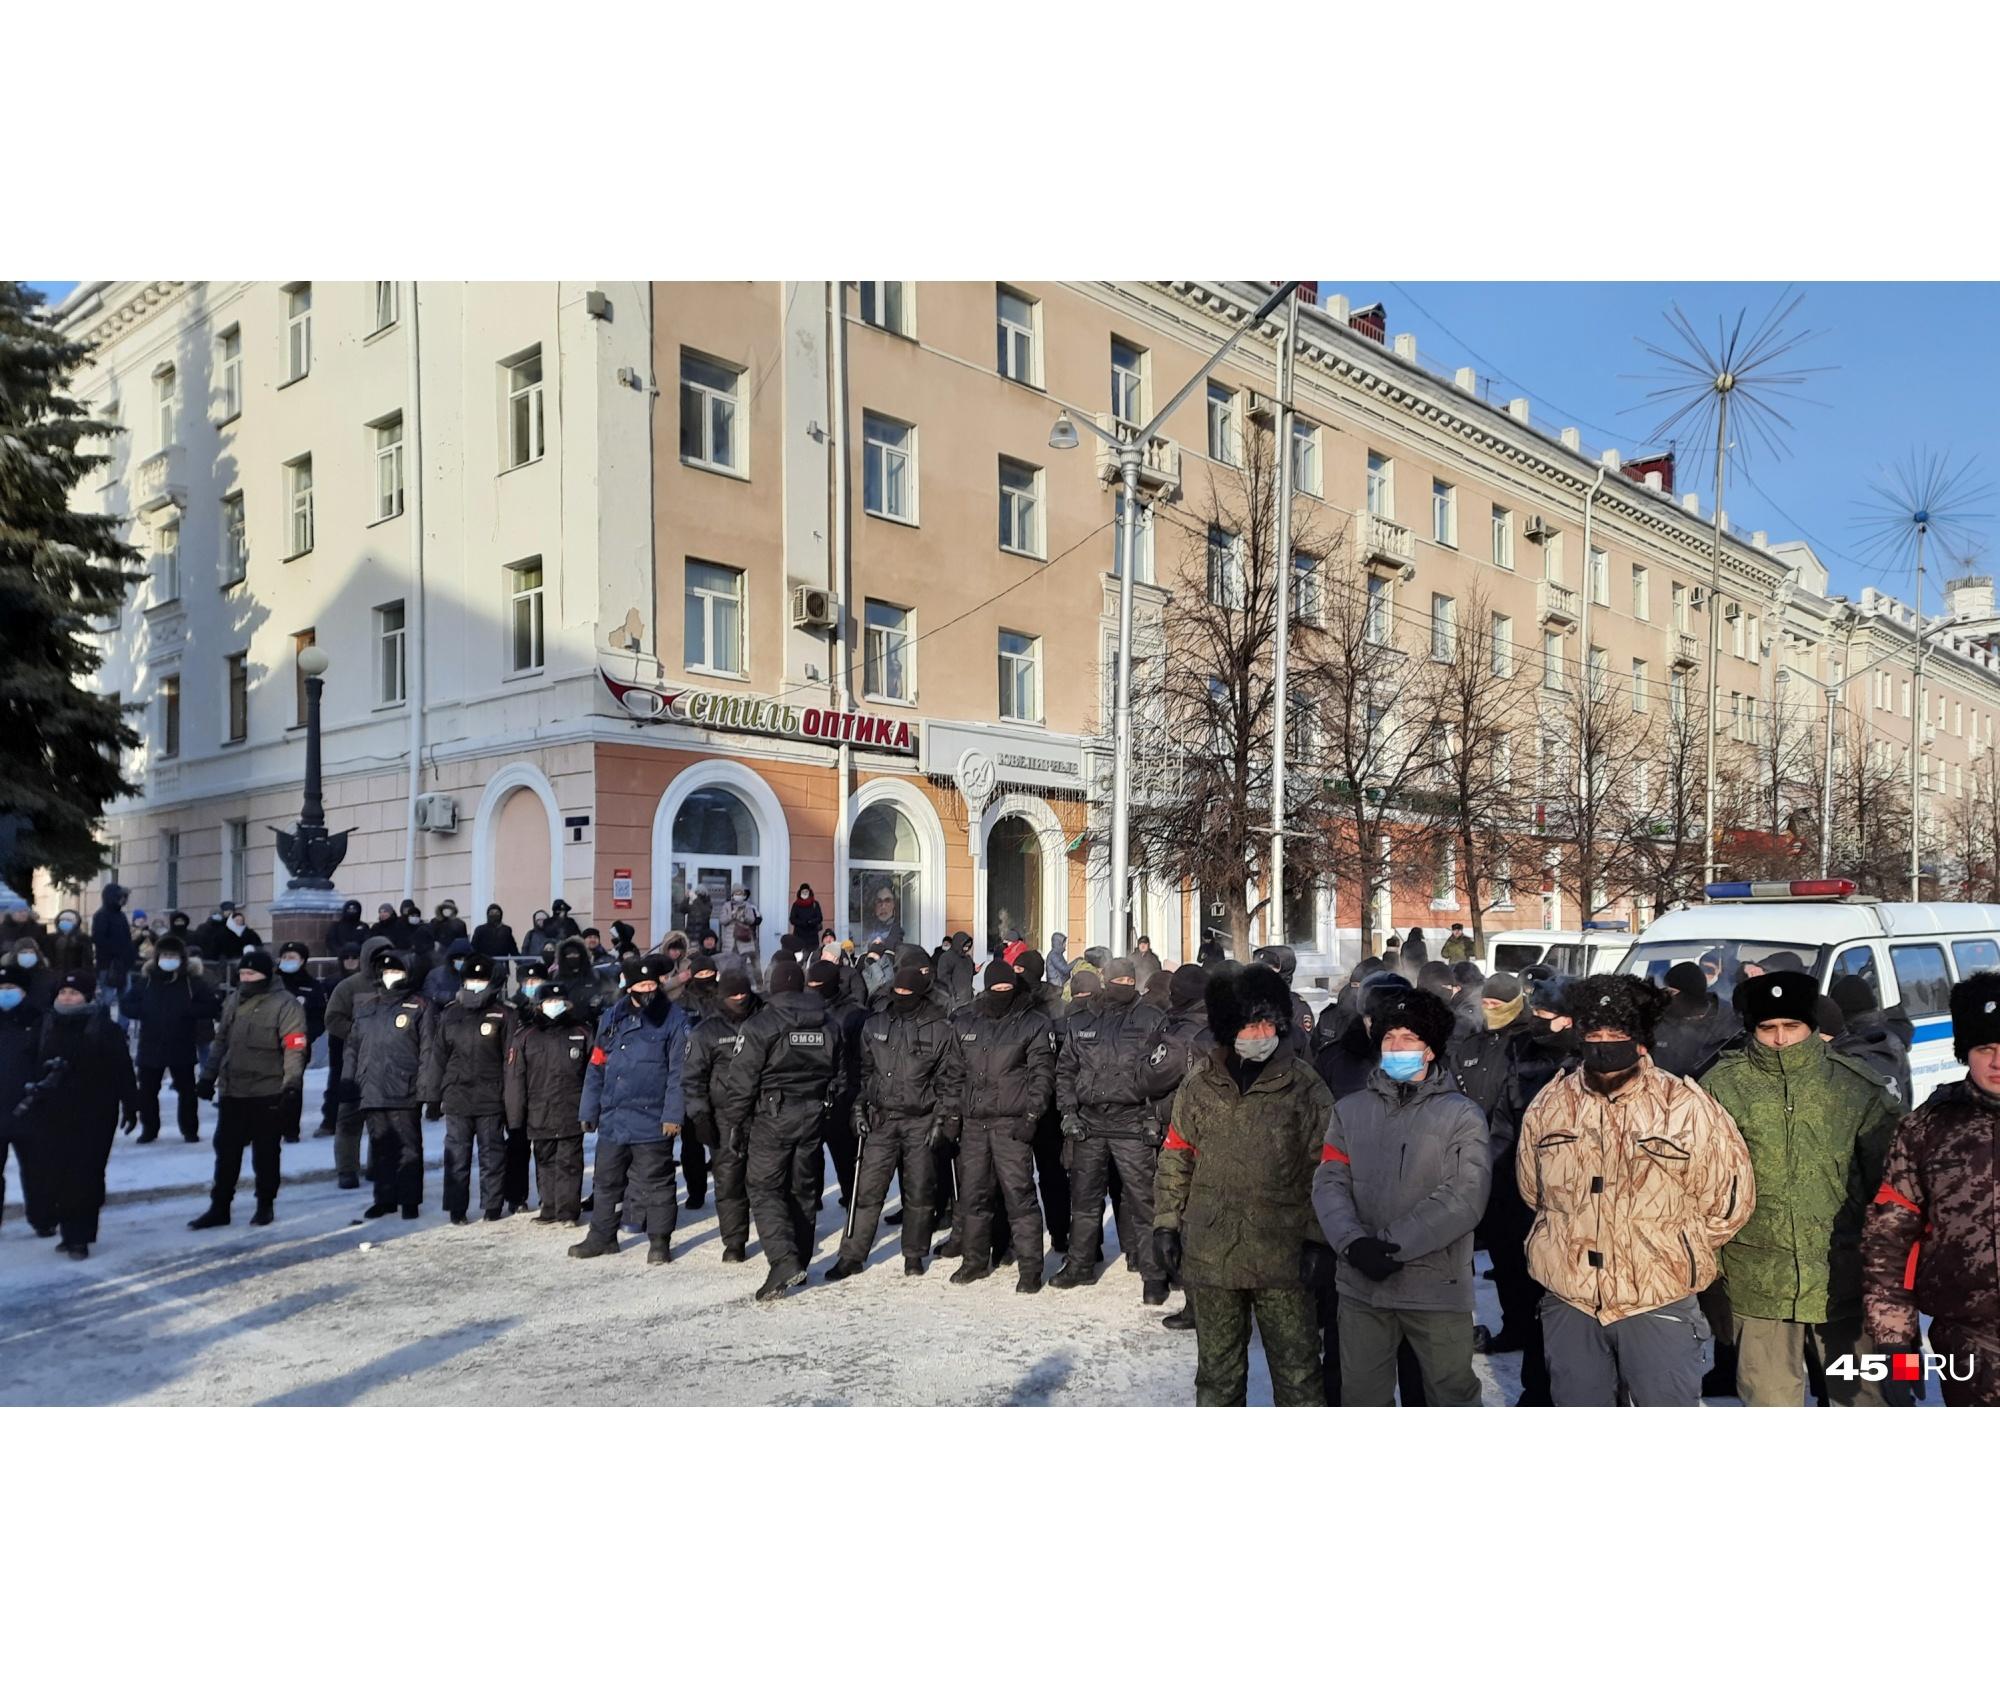 Множество силовиков следили за правопорядком на площади